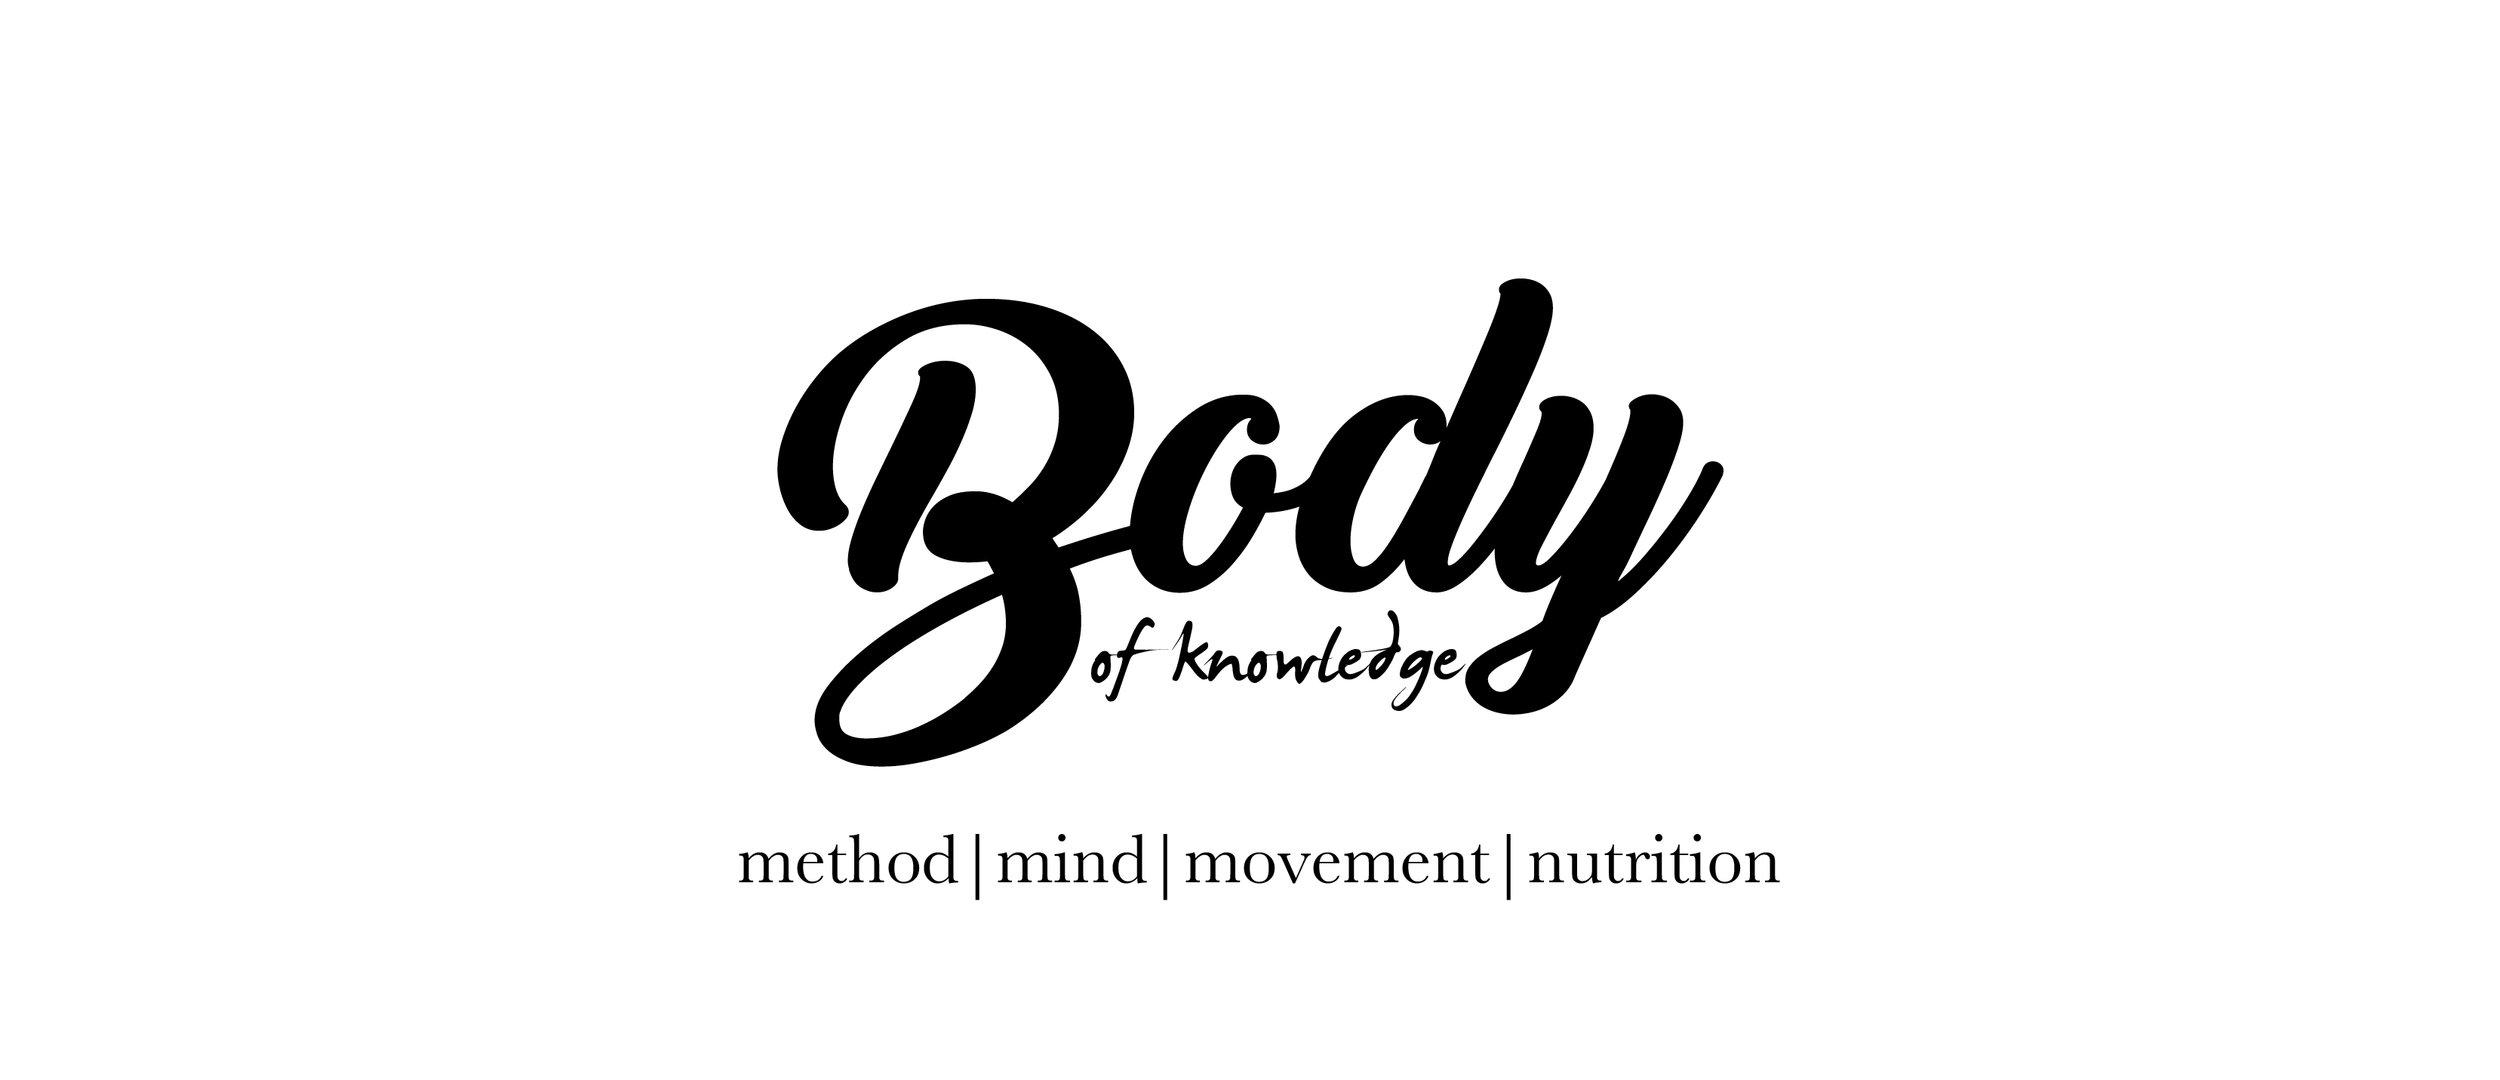 B ody of Knowledge  ,Branding, Website Design, Copywriting.